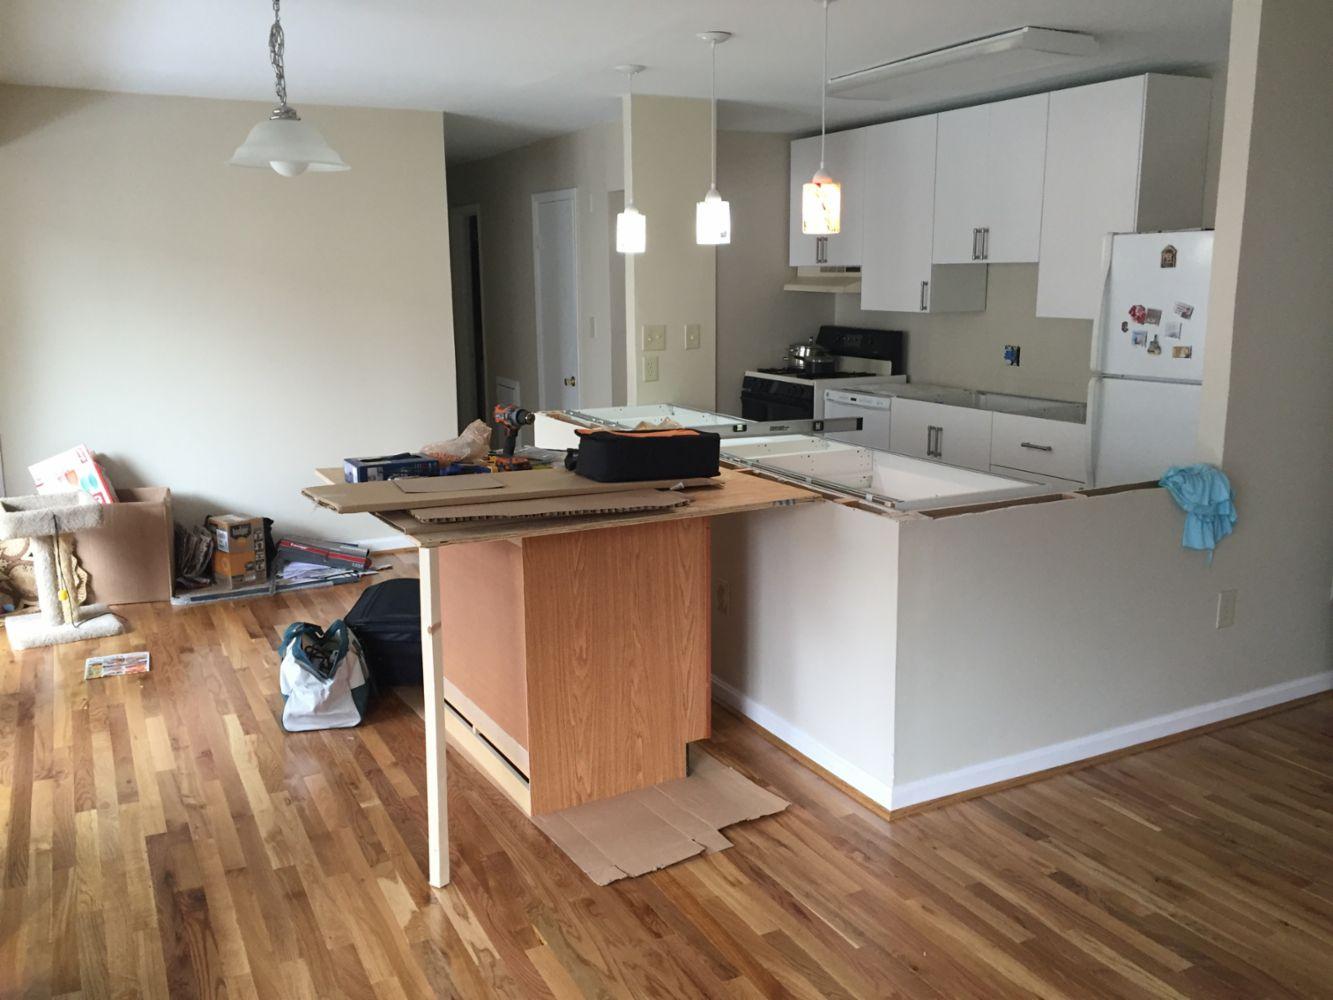 Handyman Works Home Repairs In Woodbridge Va Podgornyy Construction